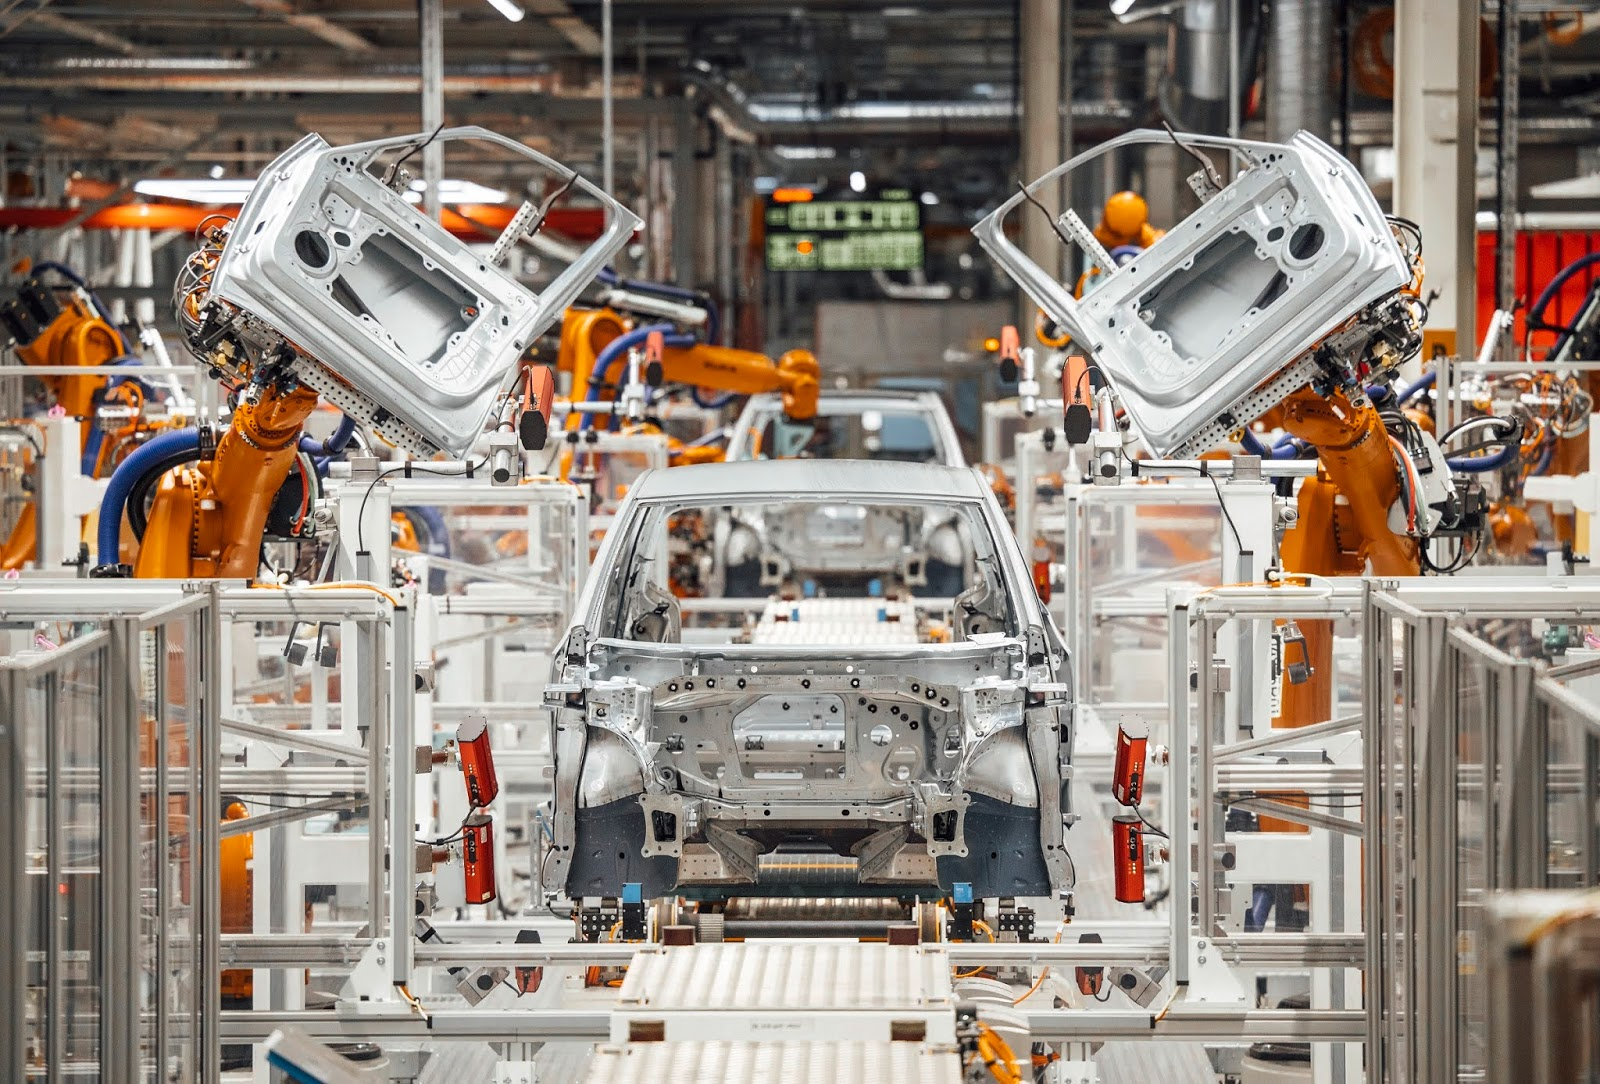 VOLKSWAGEN2B 2BZWICKAU2BPLANT Volkswagen Group: πρωτοπορία στη φιλική προς το περιβάλλον κατασκευή οχημάτων